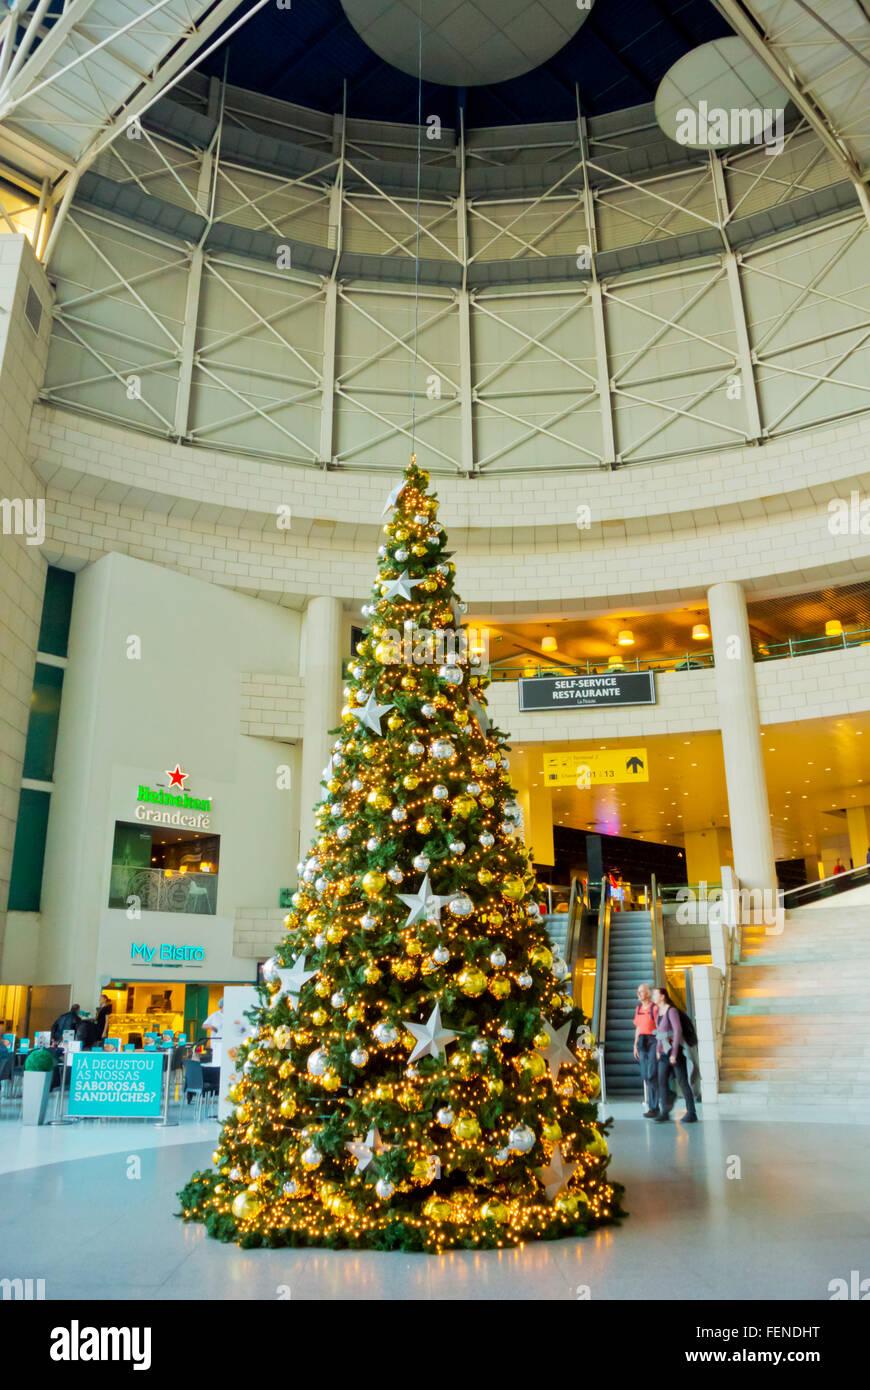 Christmas tree, aeroport, Lisbon, Portugal Stock Photo